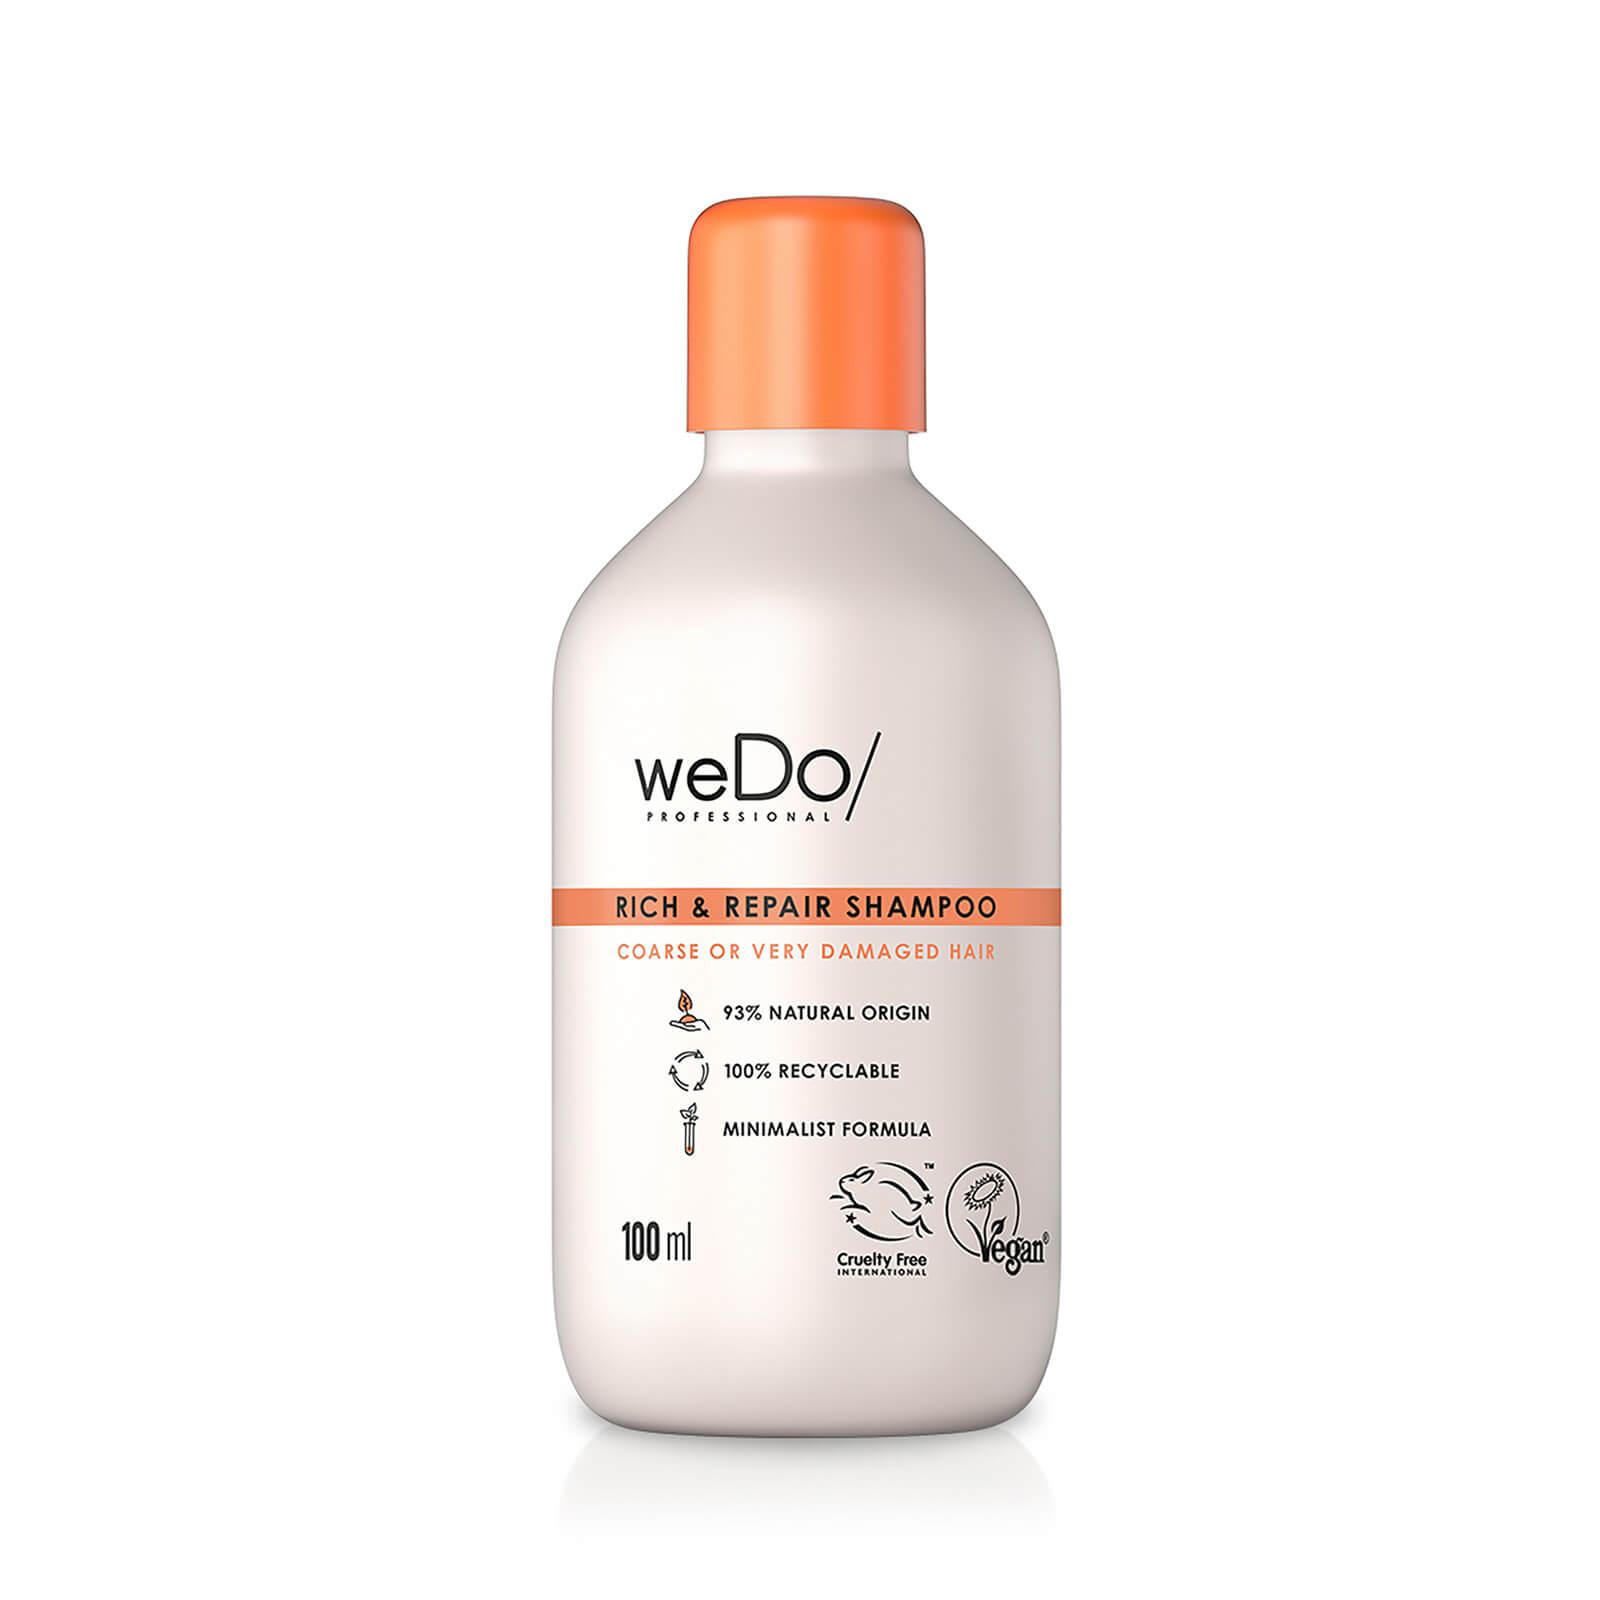 weDo/ Professional Rich and Repair Shampoo 100ml